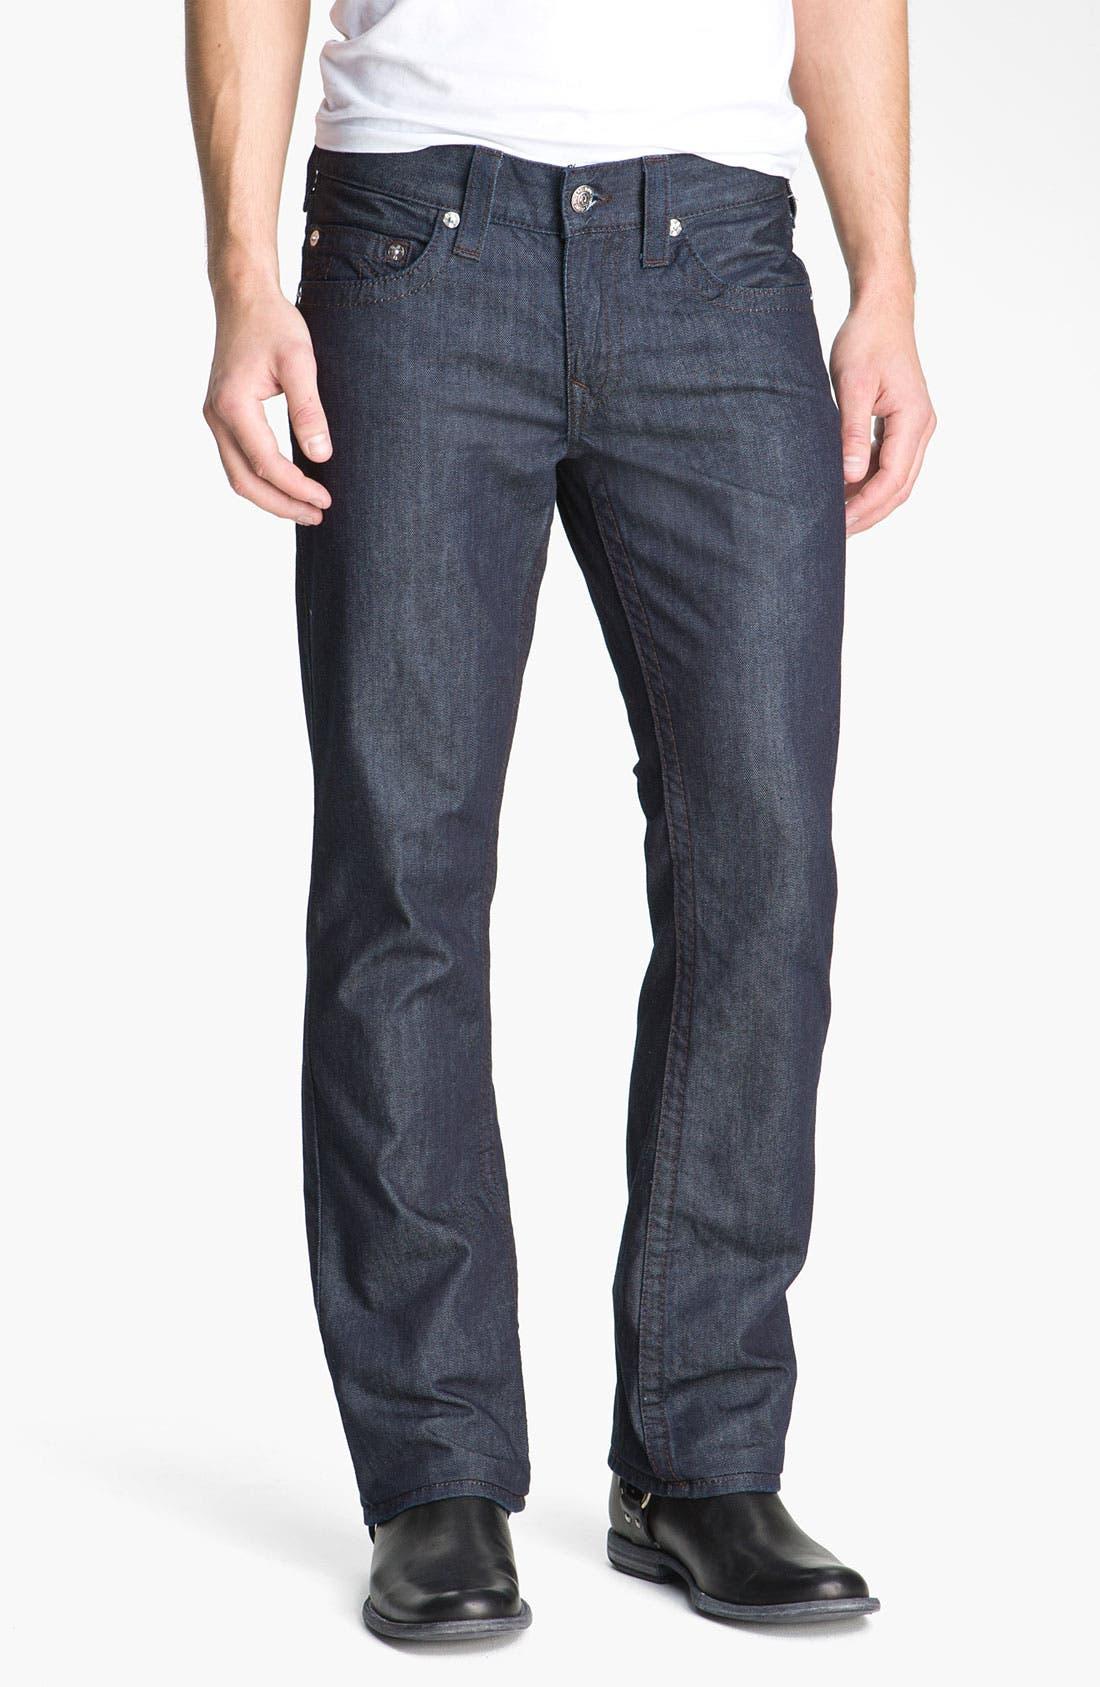 Alternate Image 2  - True Religion Brand Jeans 'Bobby' Straight Leg Jeans (Bodyrinse)